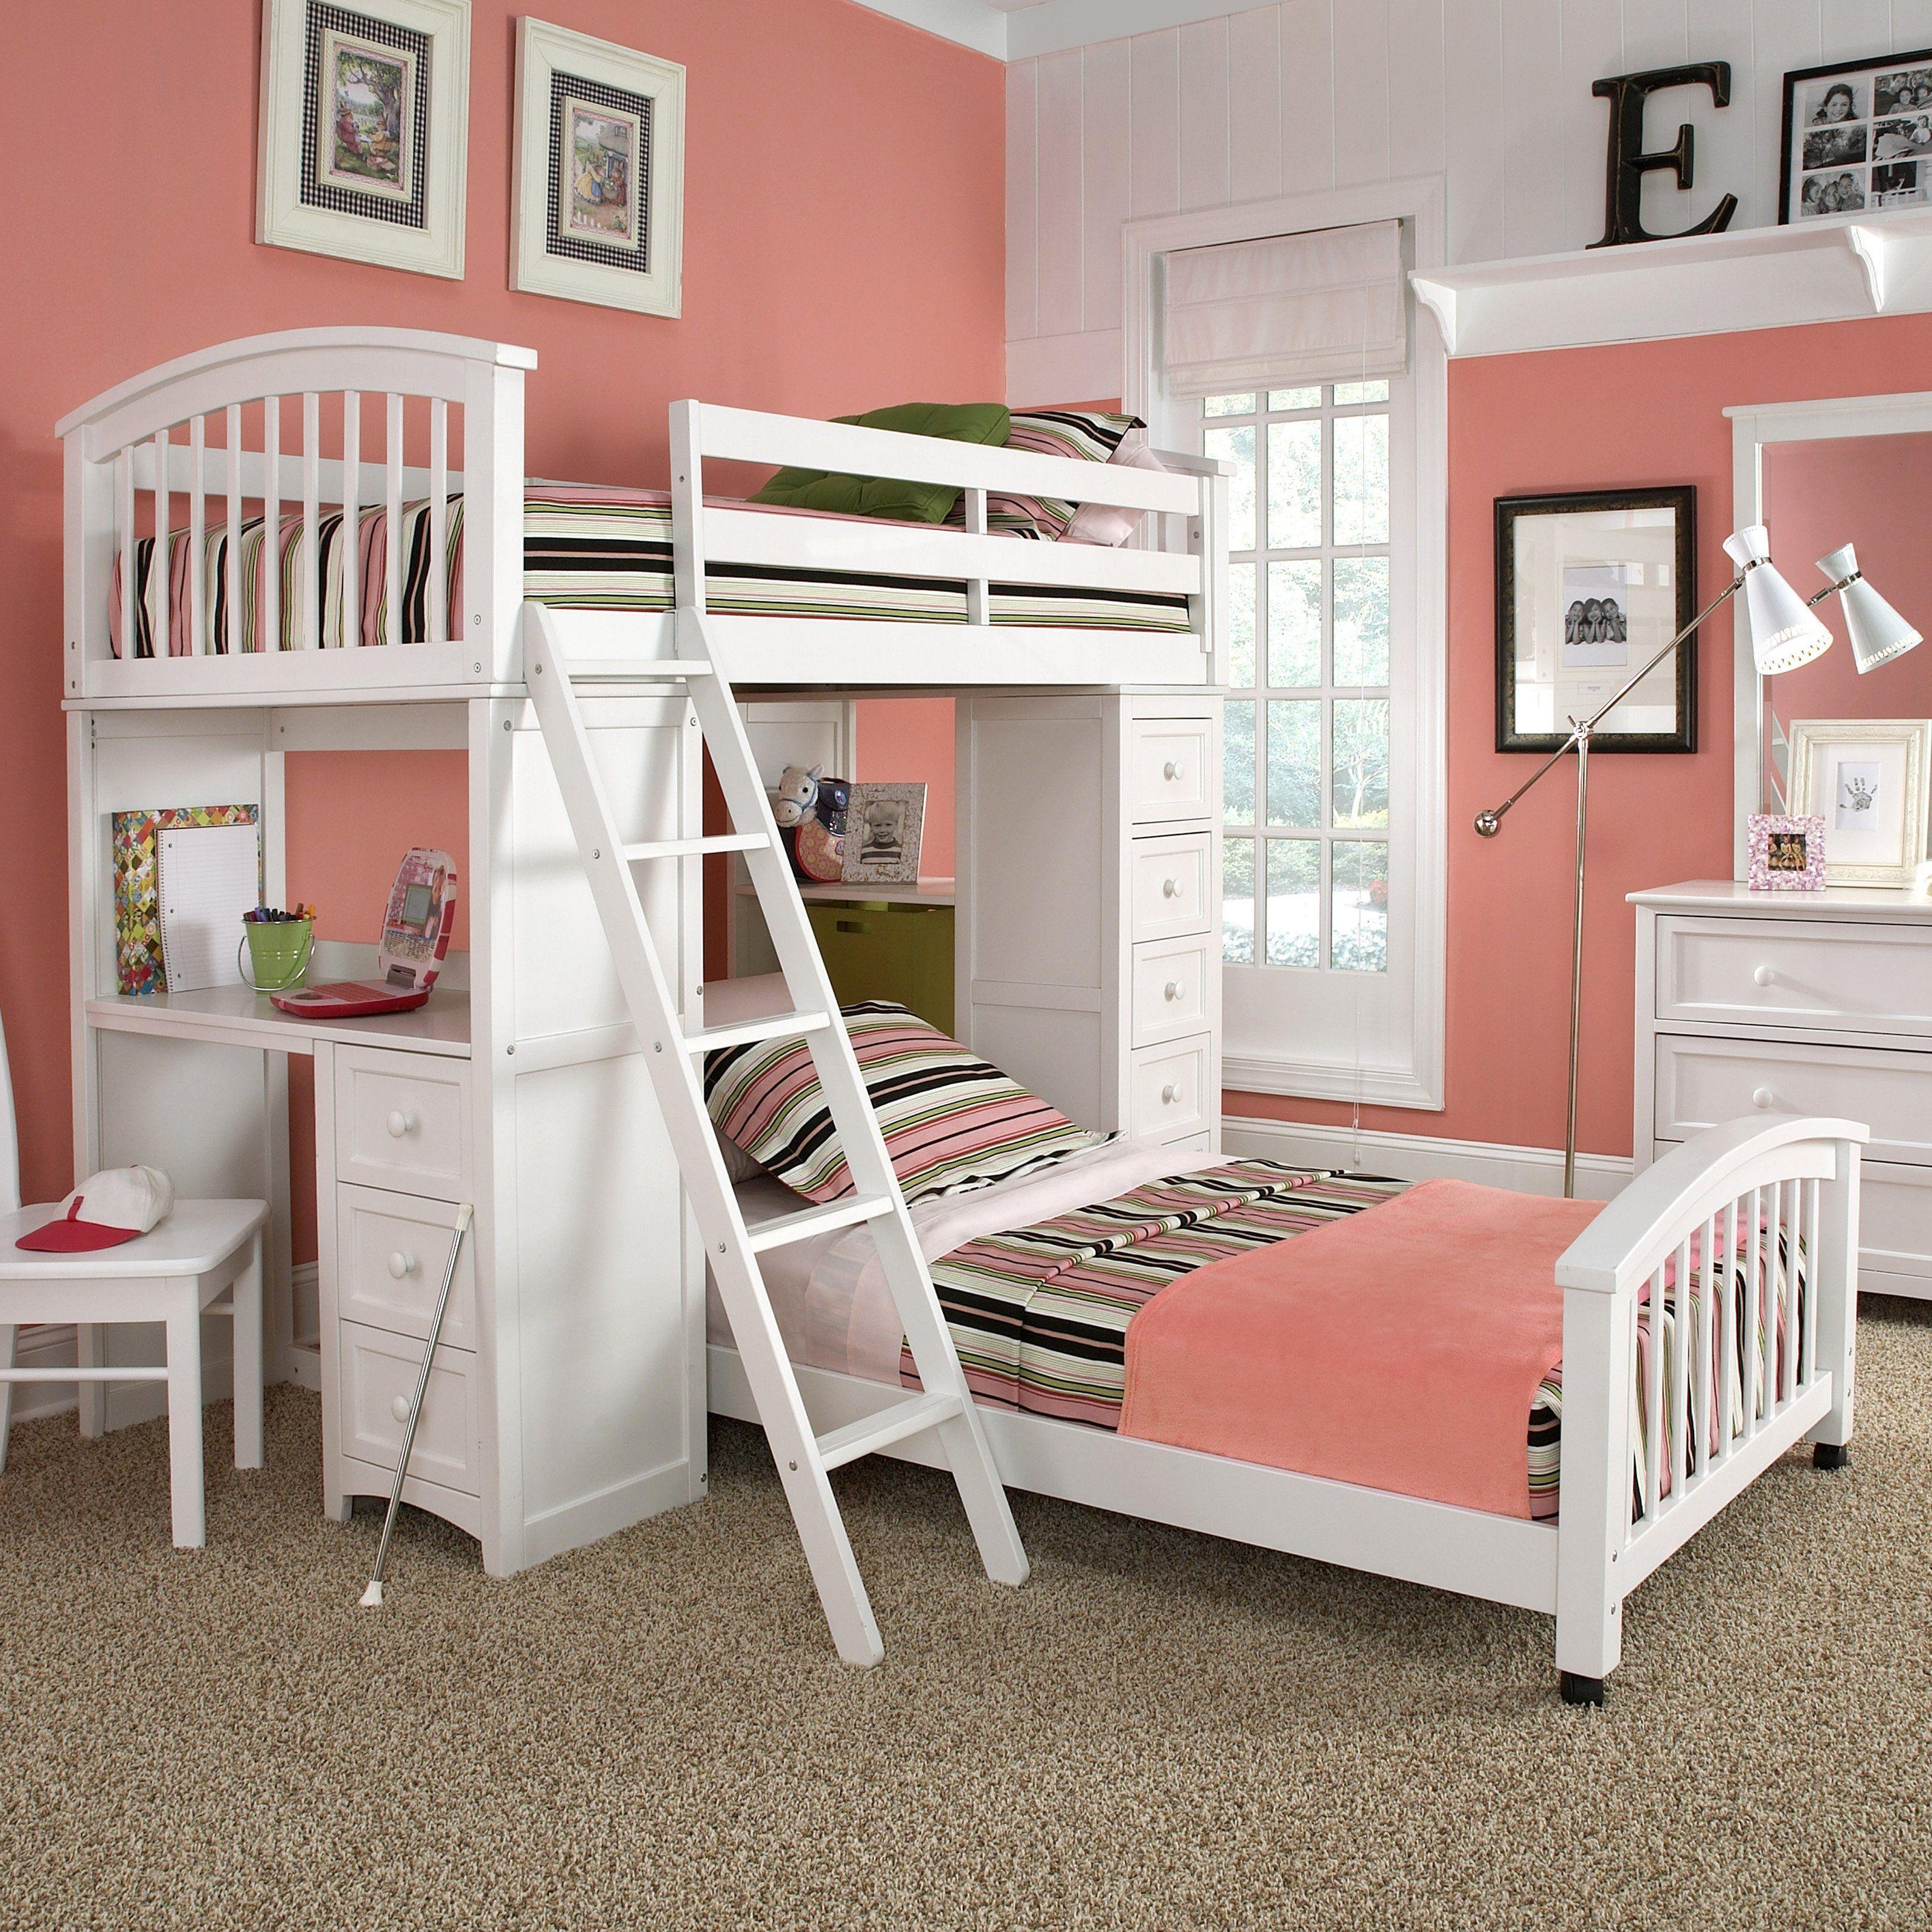 Schoolhouse Student Loft Bed White 1049 Cool Loft Beds Cool